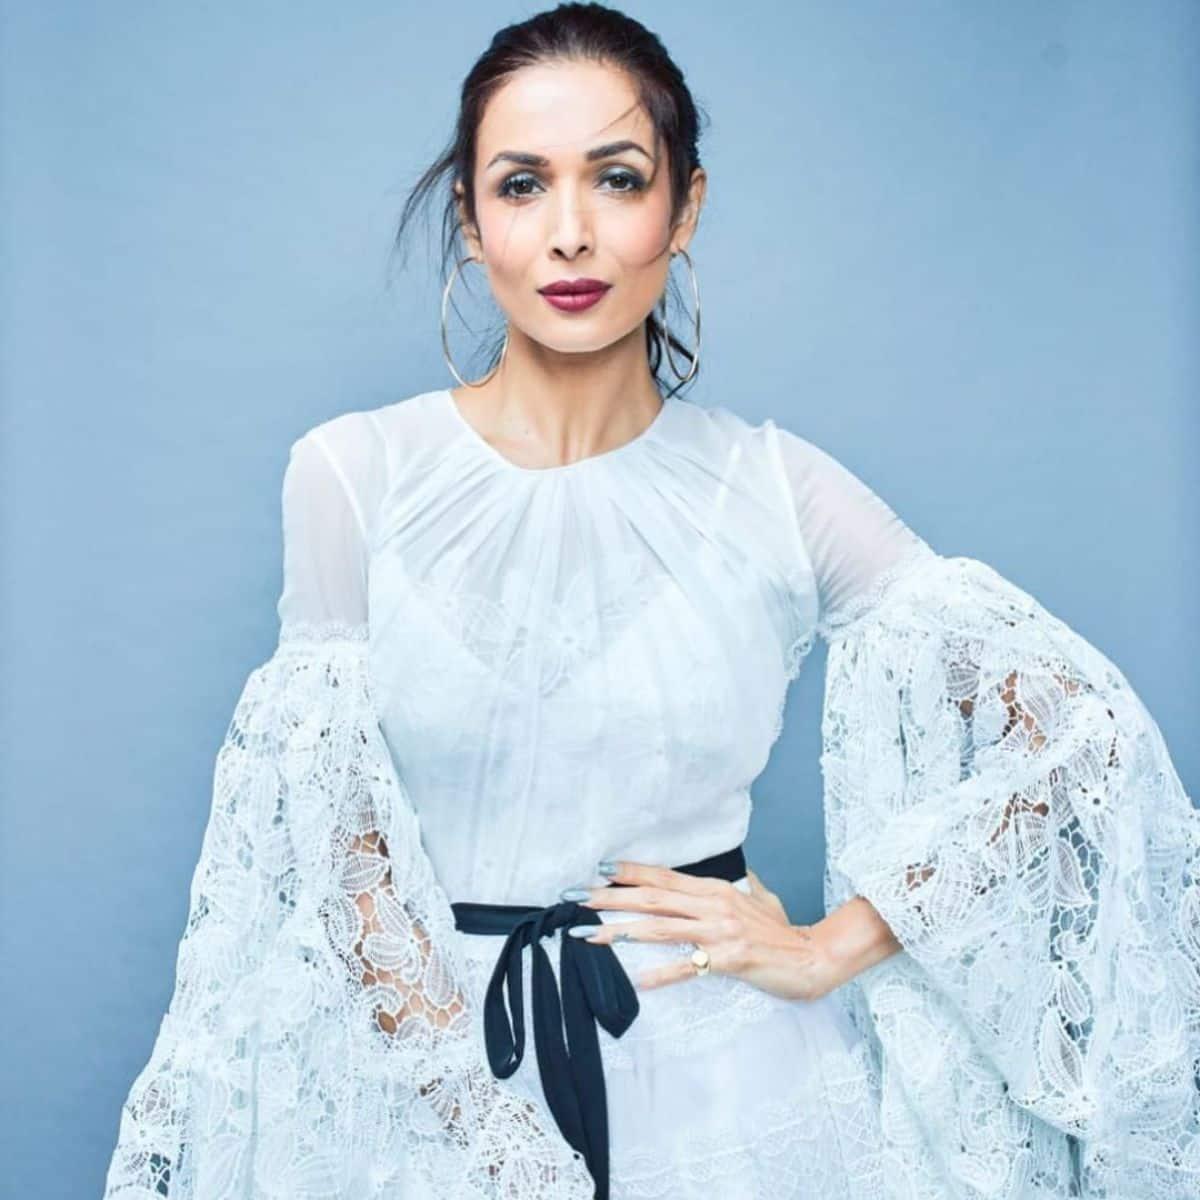 India's Best Dancer: Malaika Arora says, 'Chaiyya chaiyya shouldn't be recreated'